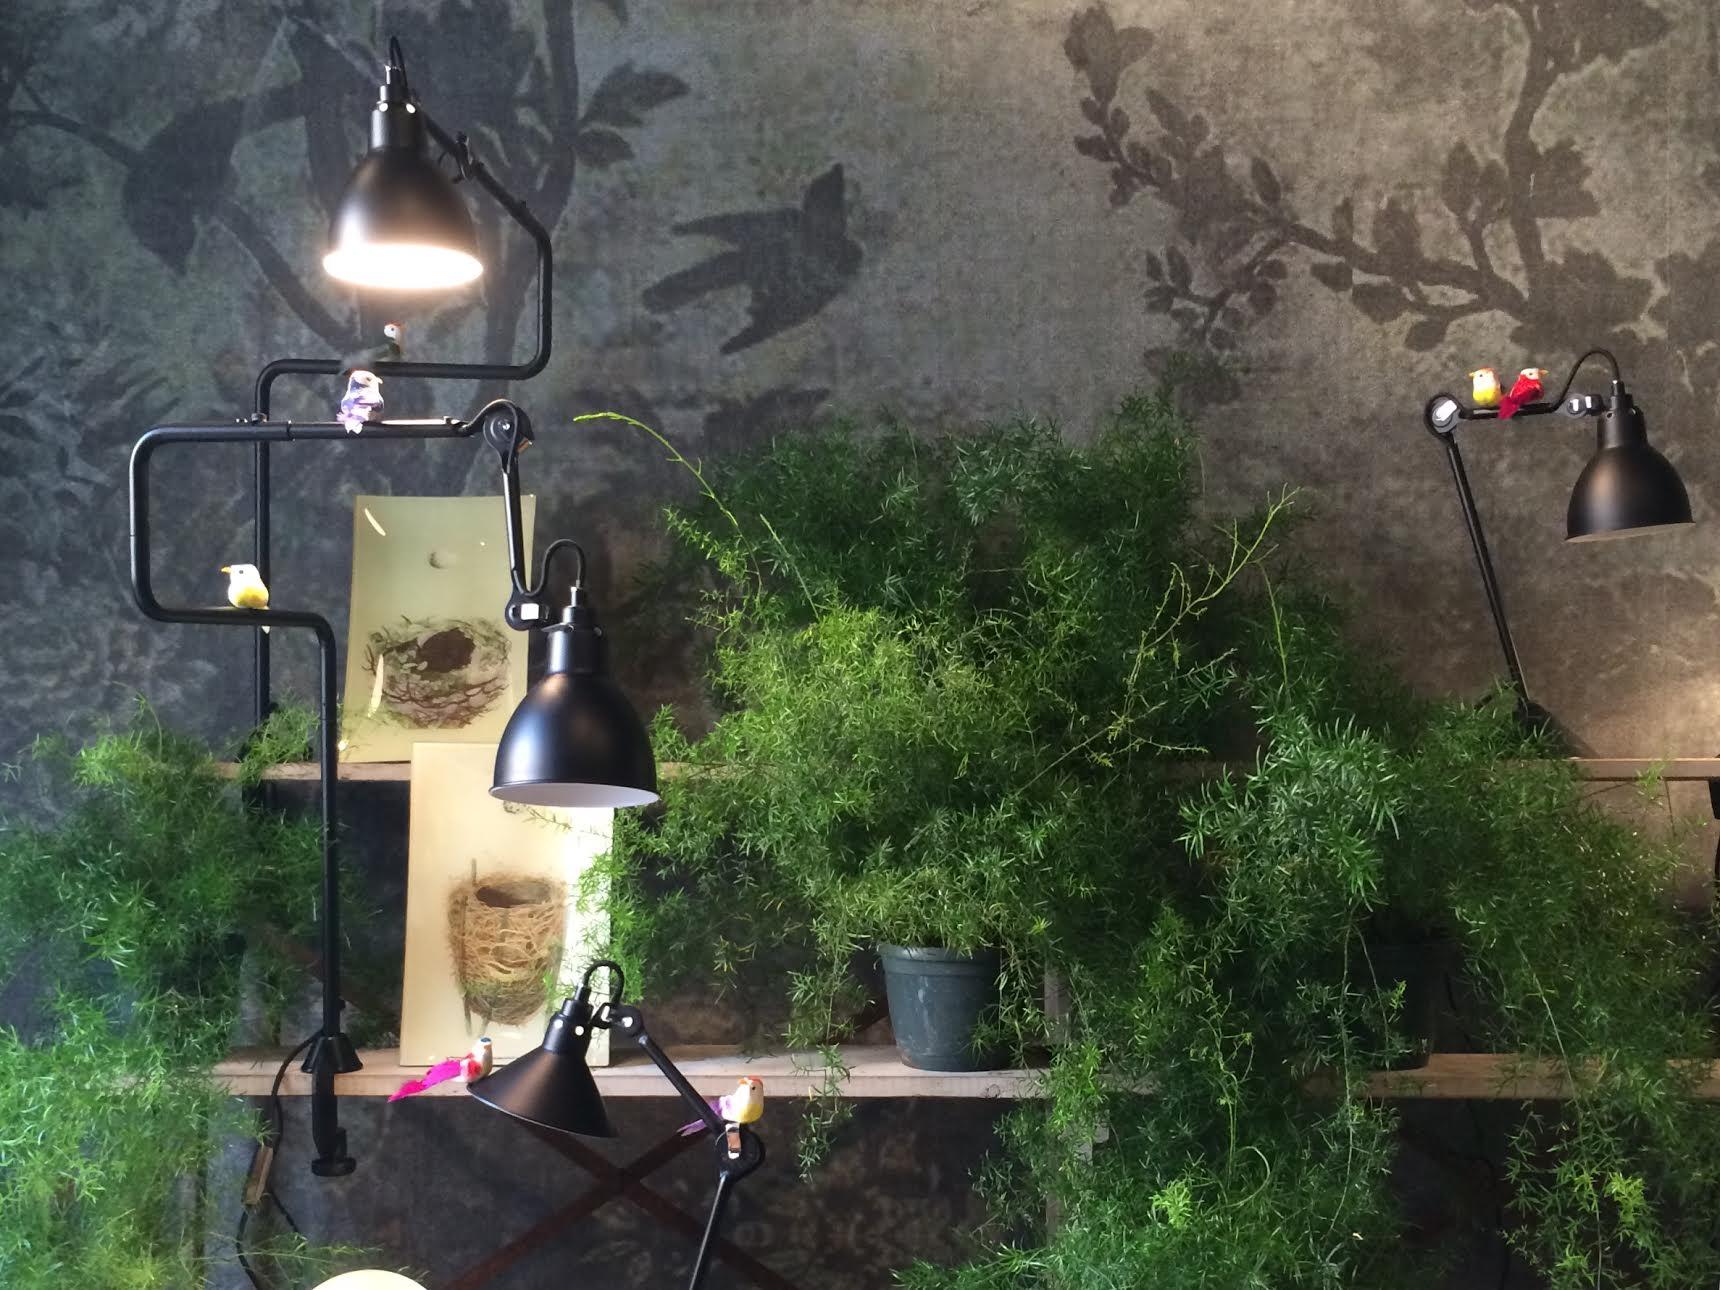 Lampe Gras, Wall&Decò wallpaper at RAW, via Palermo